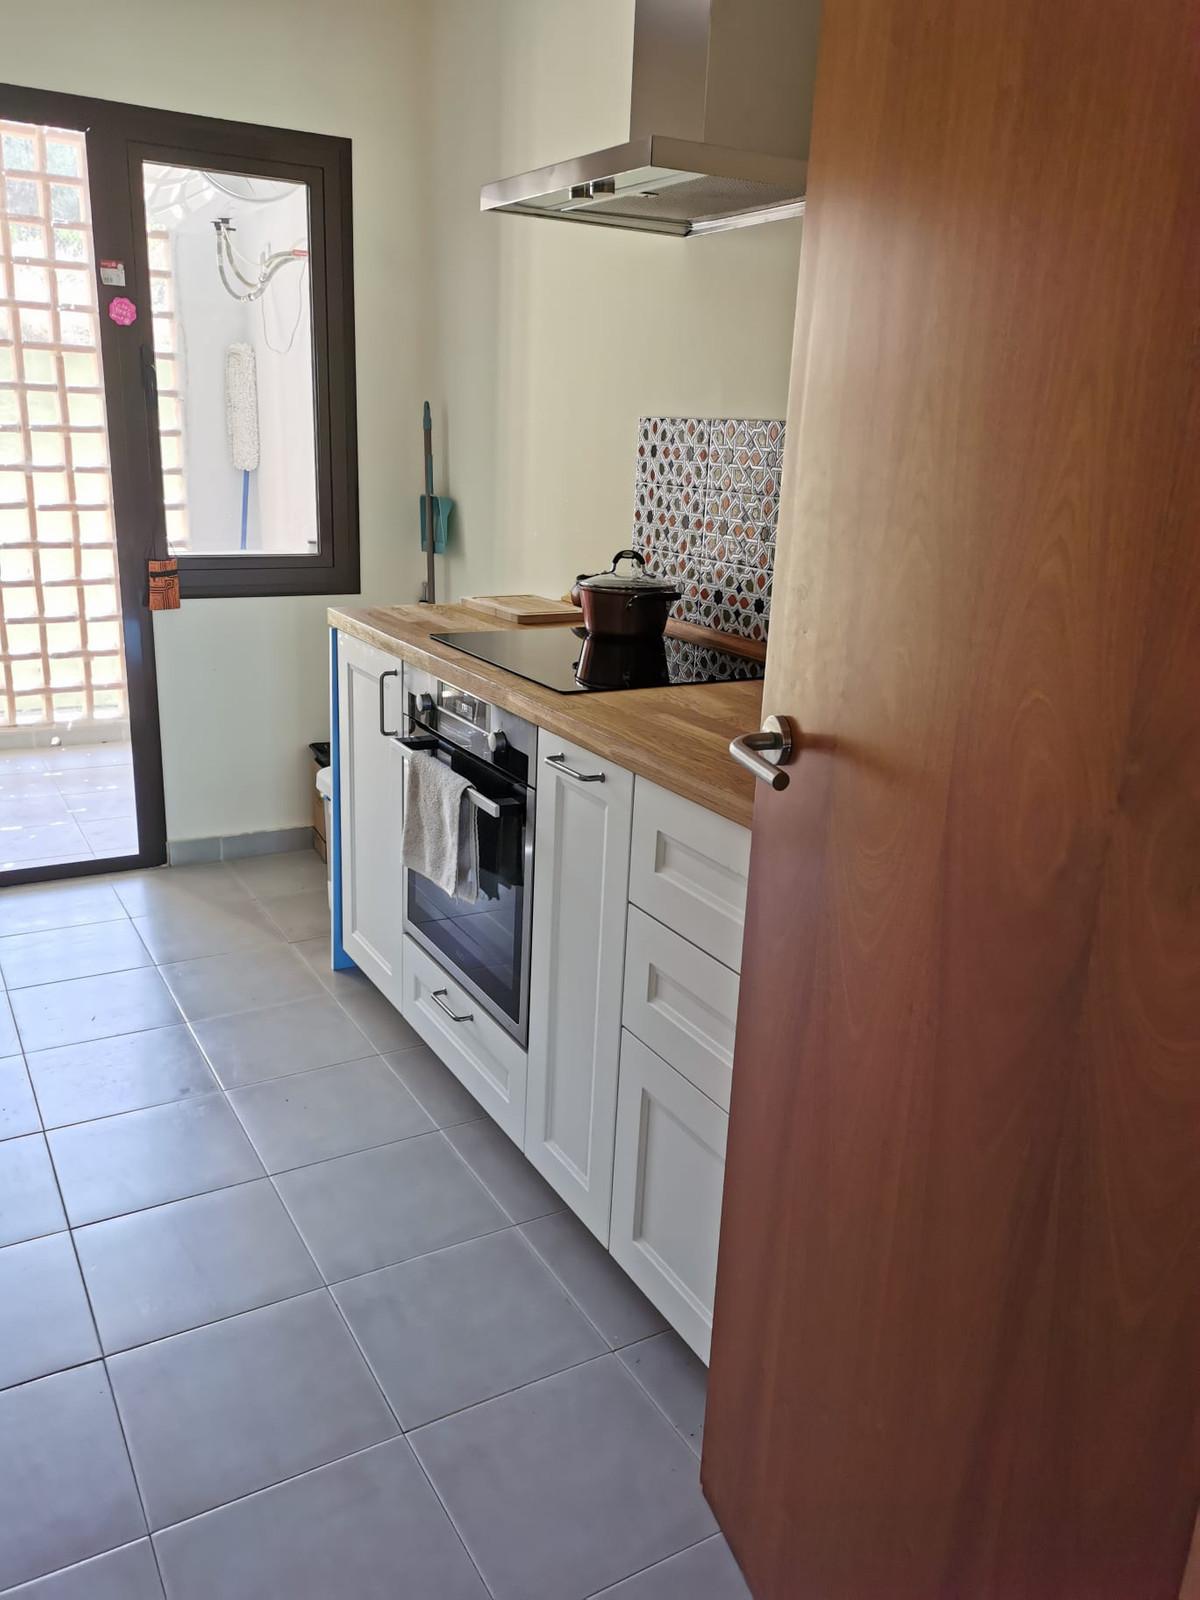 R3882193 | Penthouse in Estepona – € 175,500 – 2 beds, 2 baths